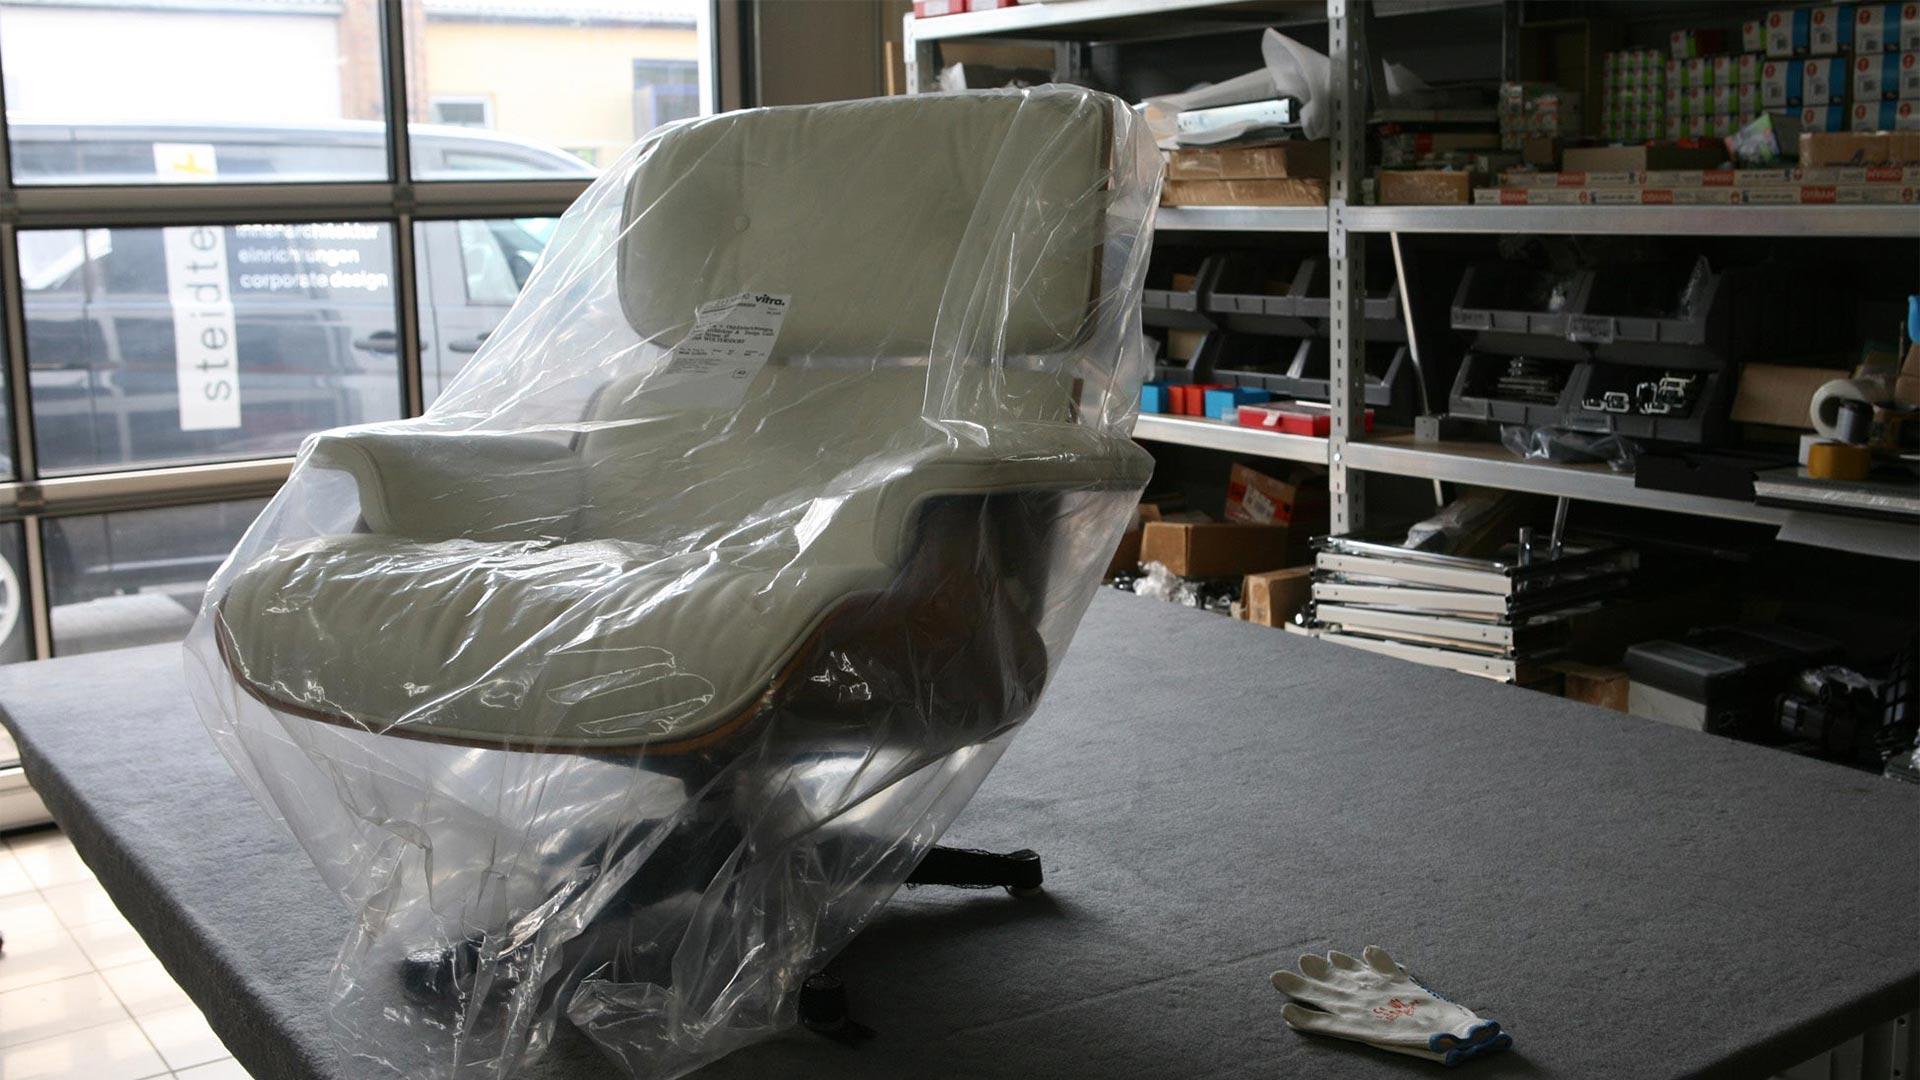 Reparatur Vitra Eames Lounge Chair Ersatzteile in Berlin bei steiden+10